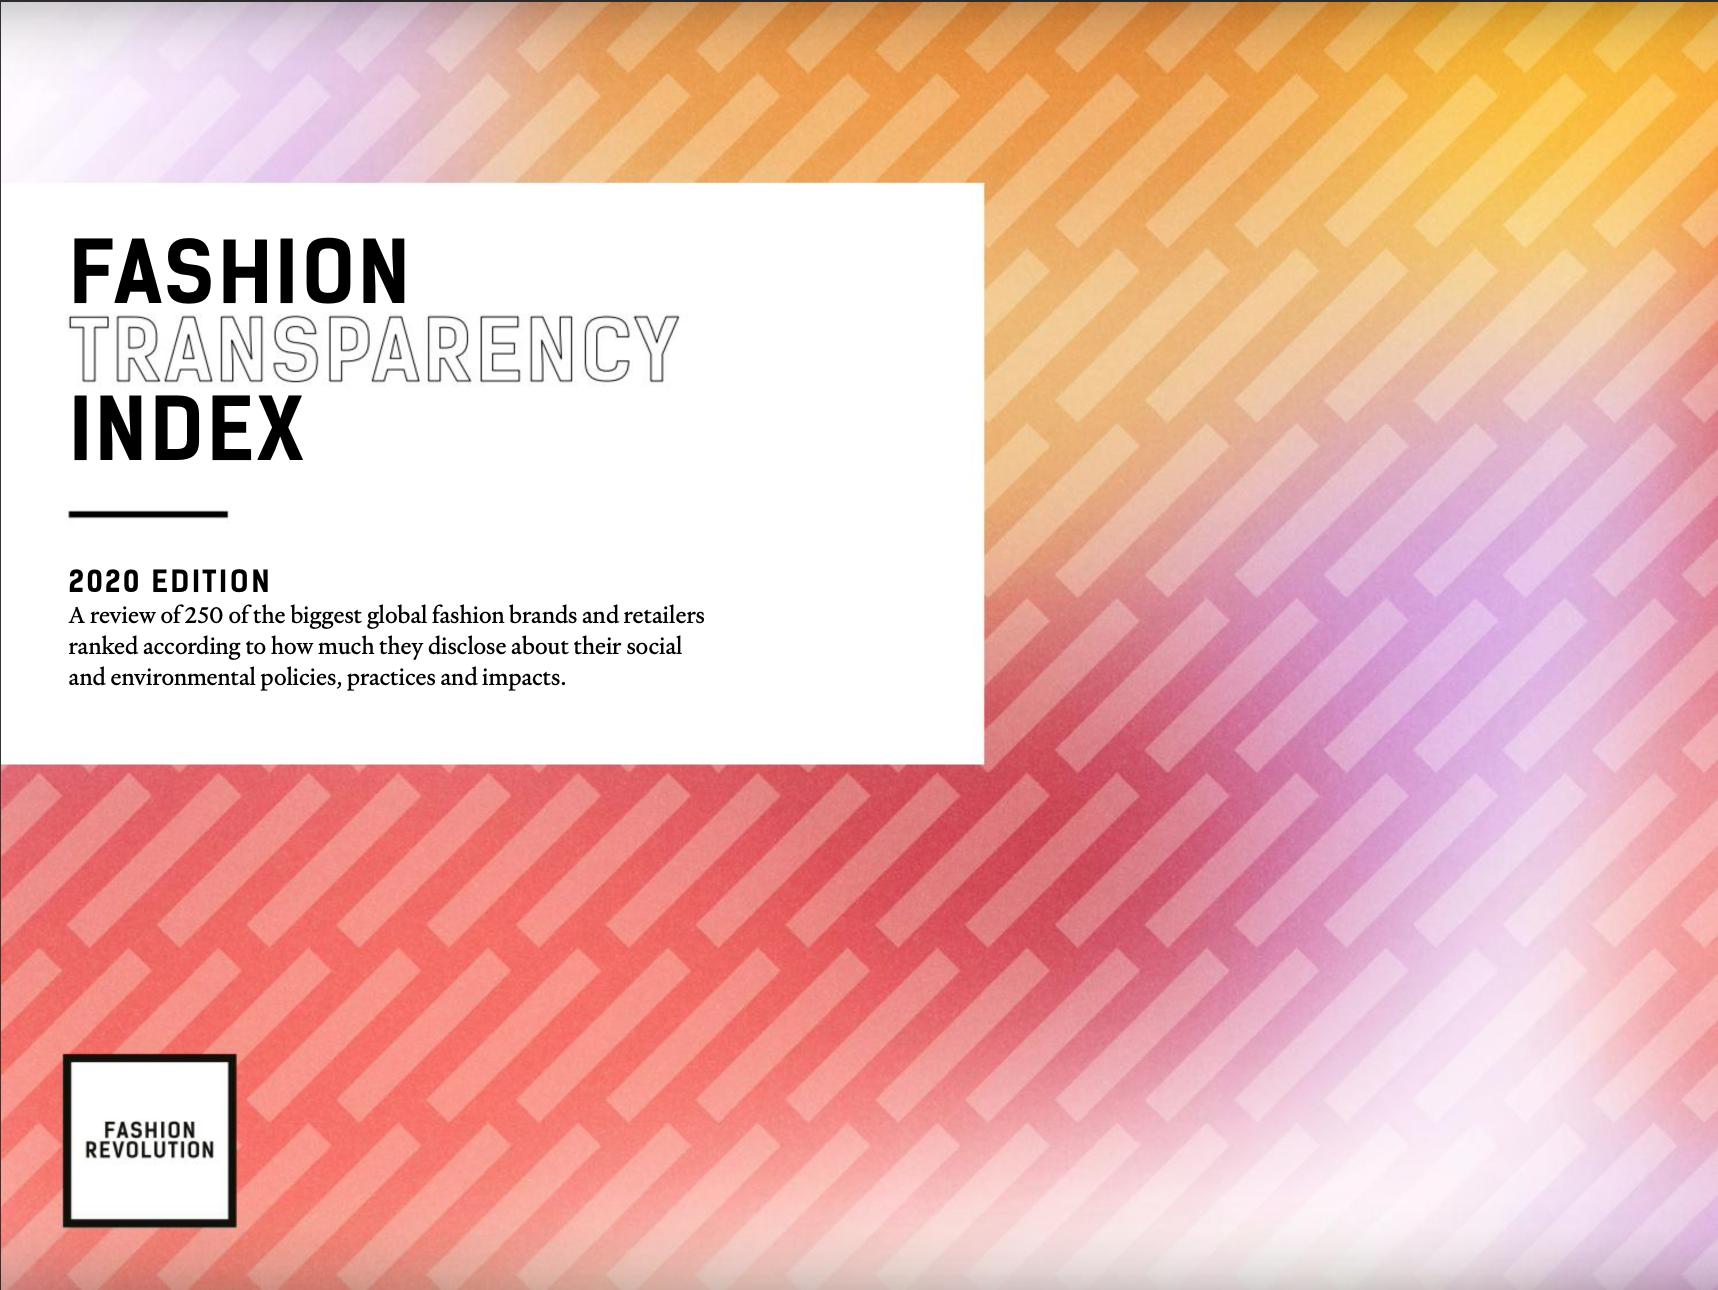 Fashion Revolution Transparency Index 20